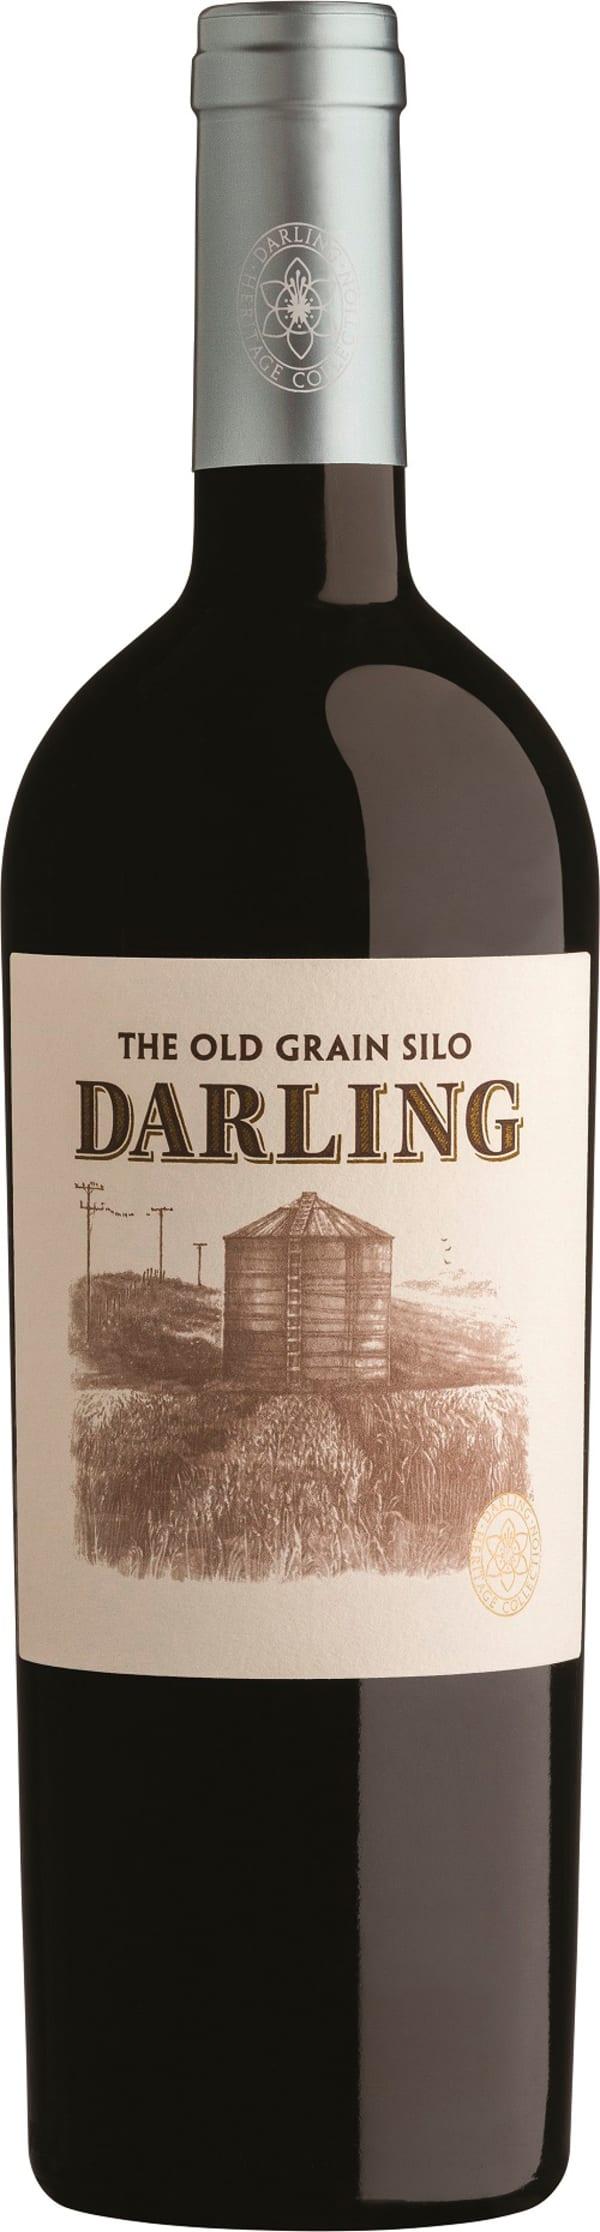 Darling Cellars The Old Grain Silo 2018